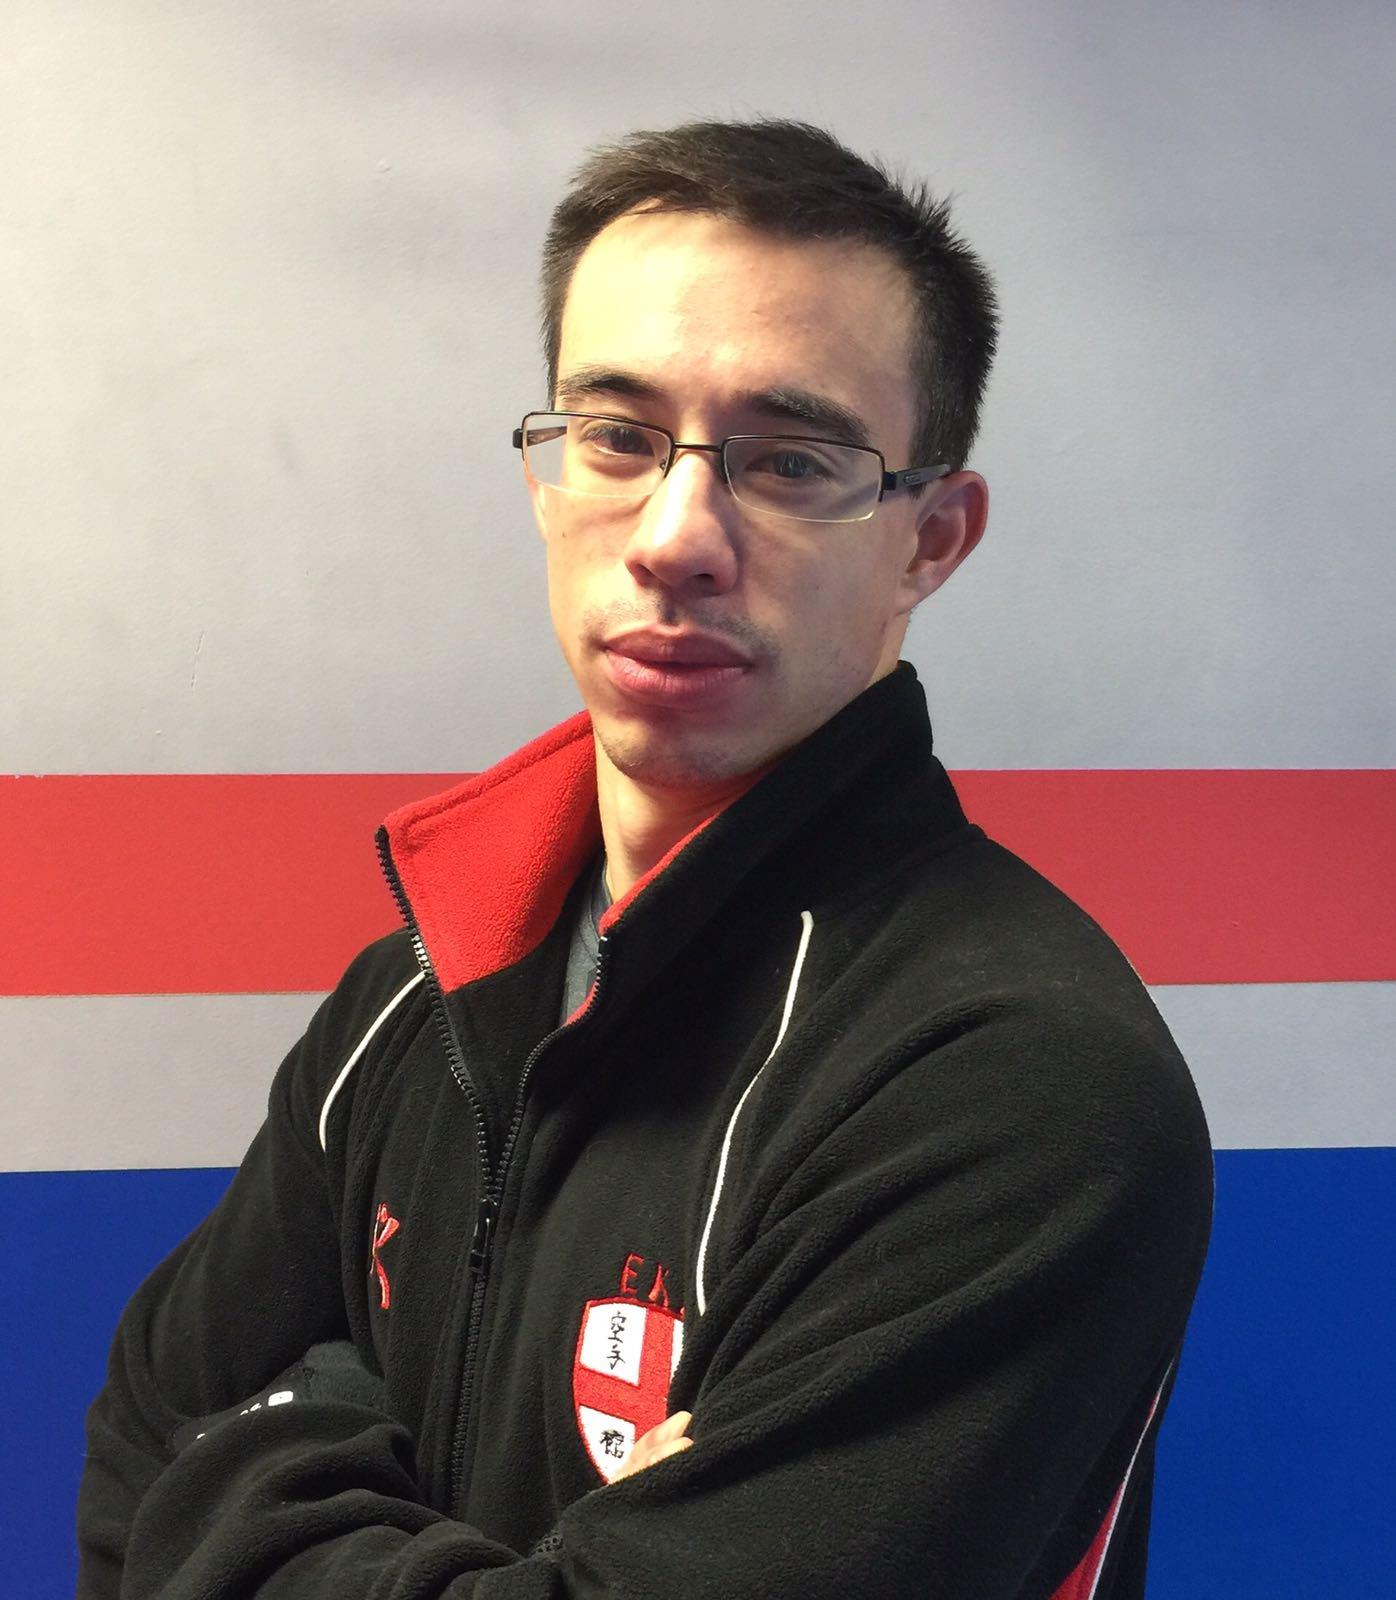 Philippe Clairett Technical Advisor - Shotokan